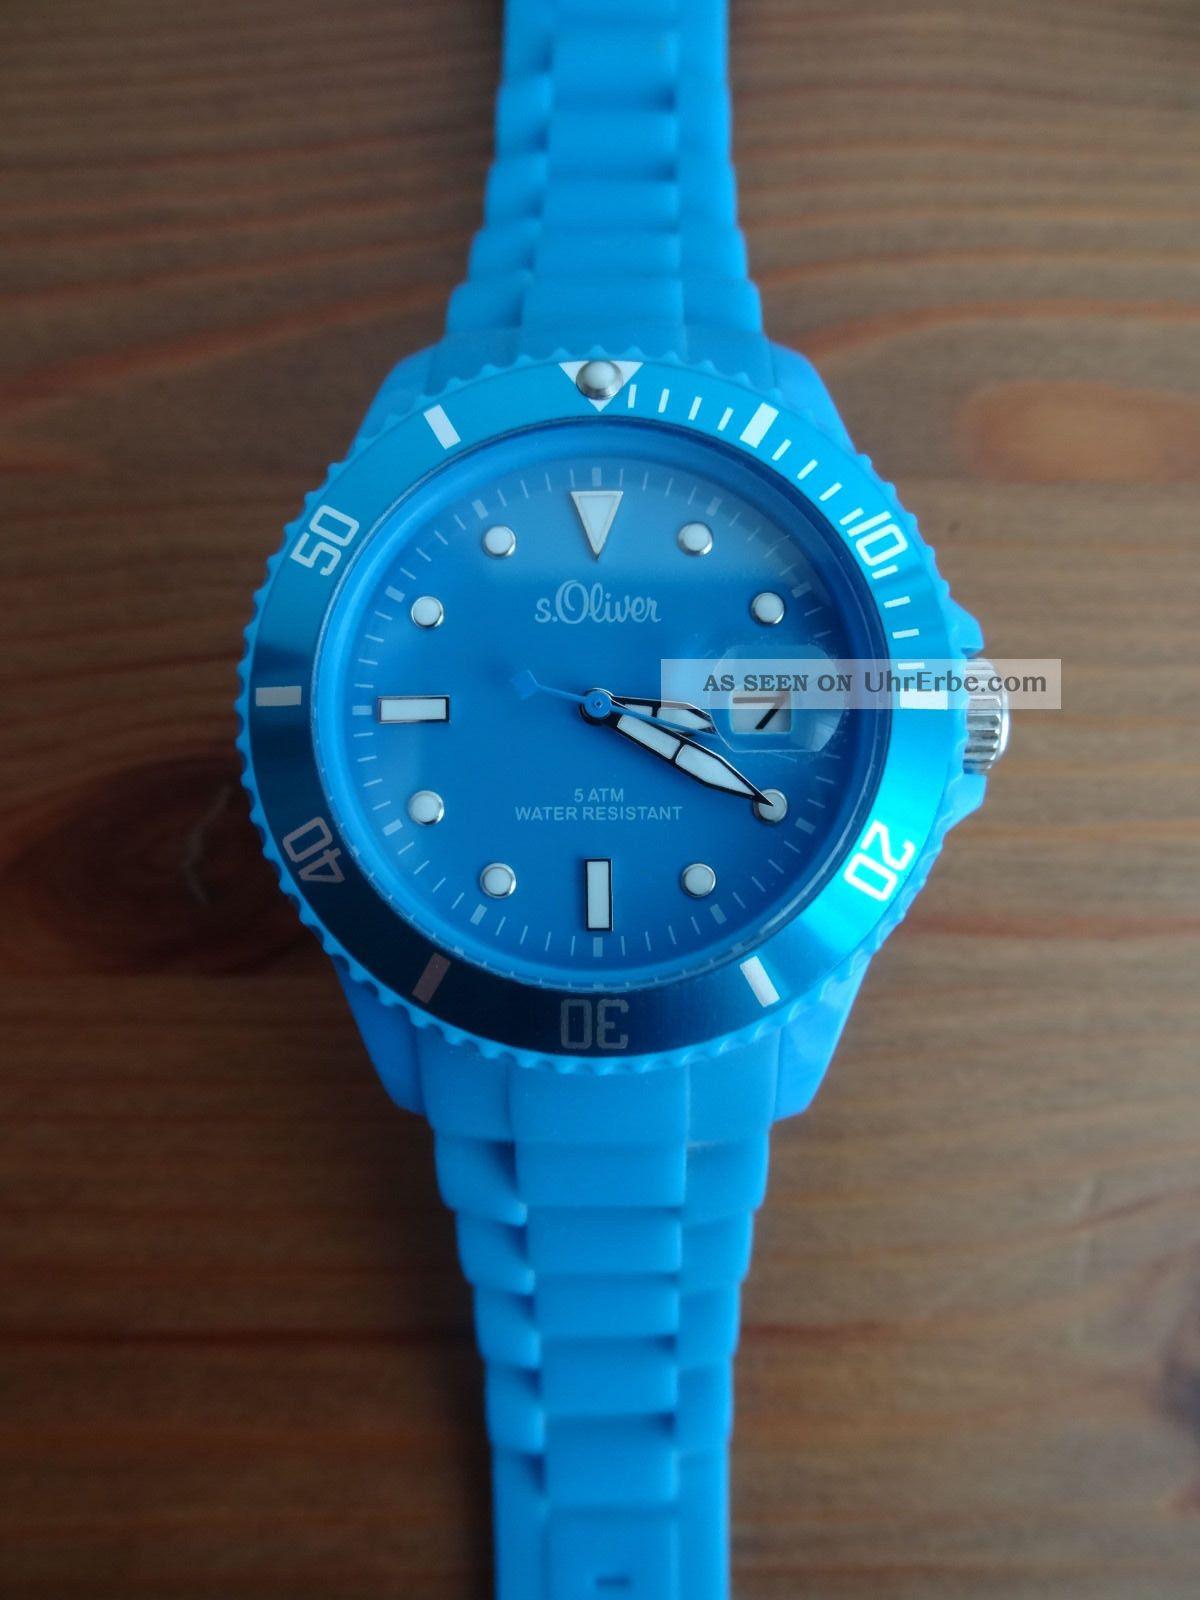 S.  Oliver Unisex - Armbanduhr Silikon Blau Analog Quarz So - 1993 - Pq,  Wie Armbanduhren Bild